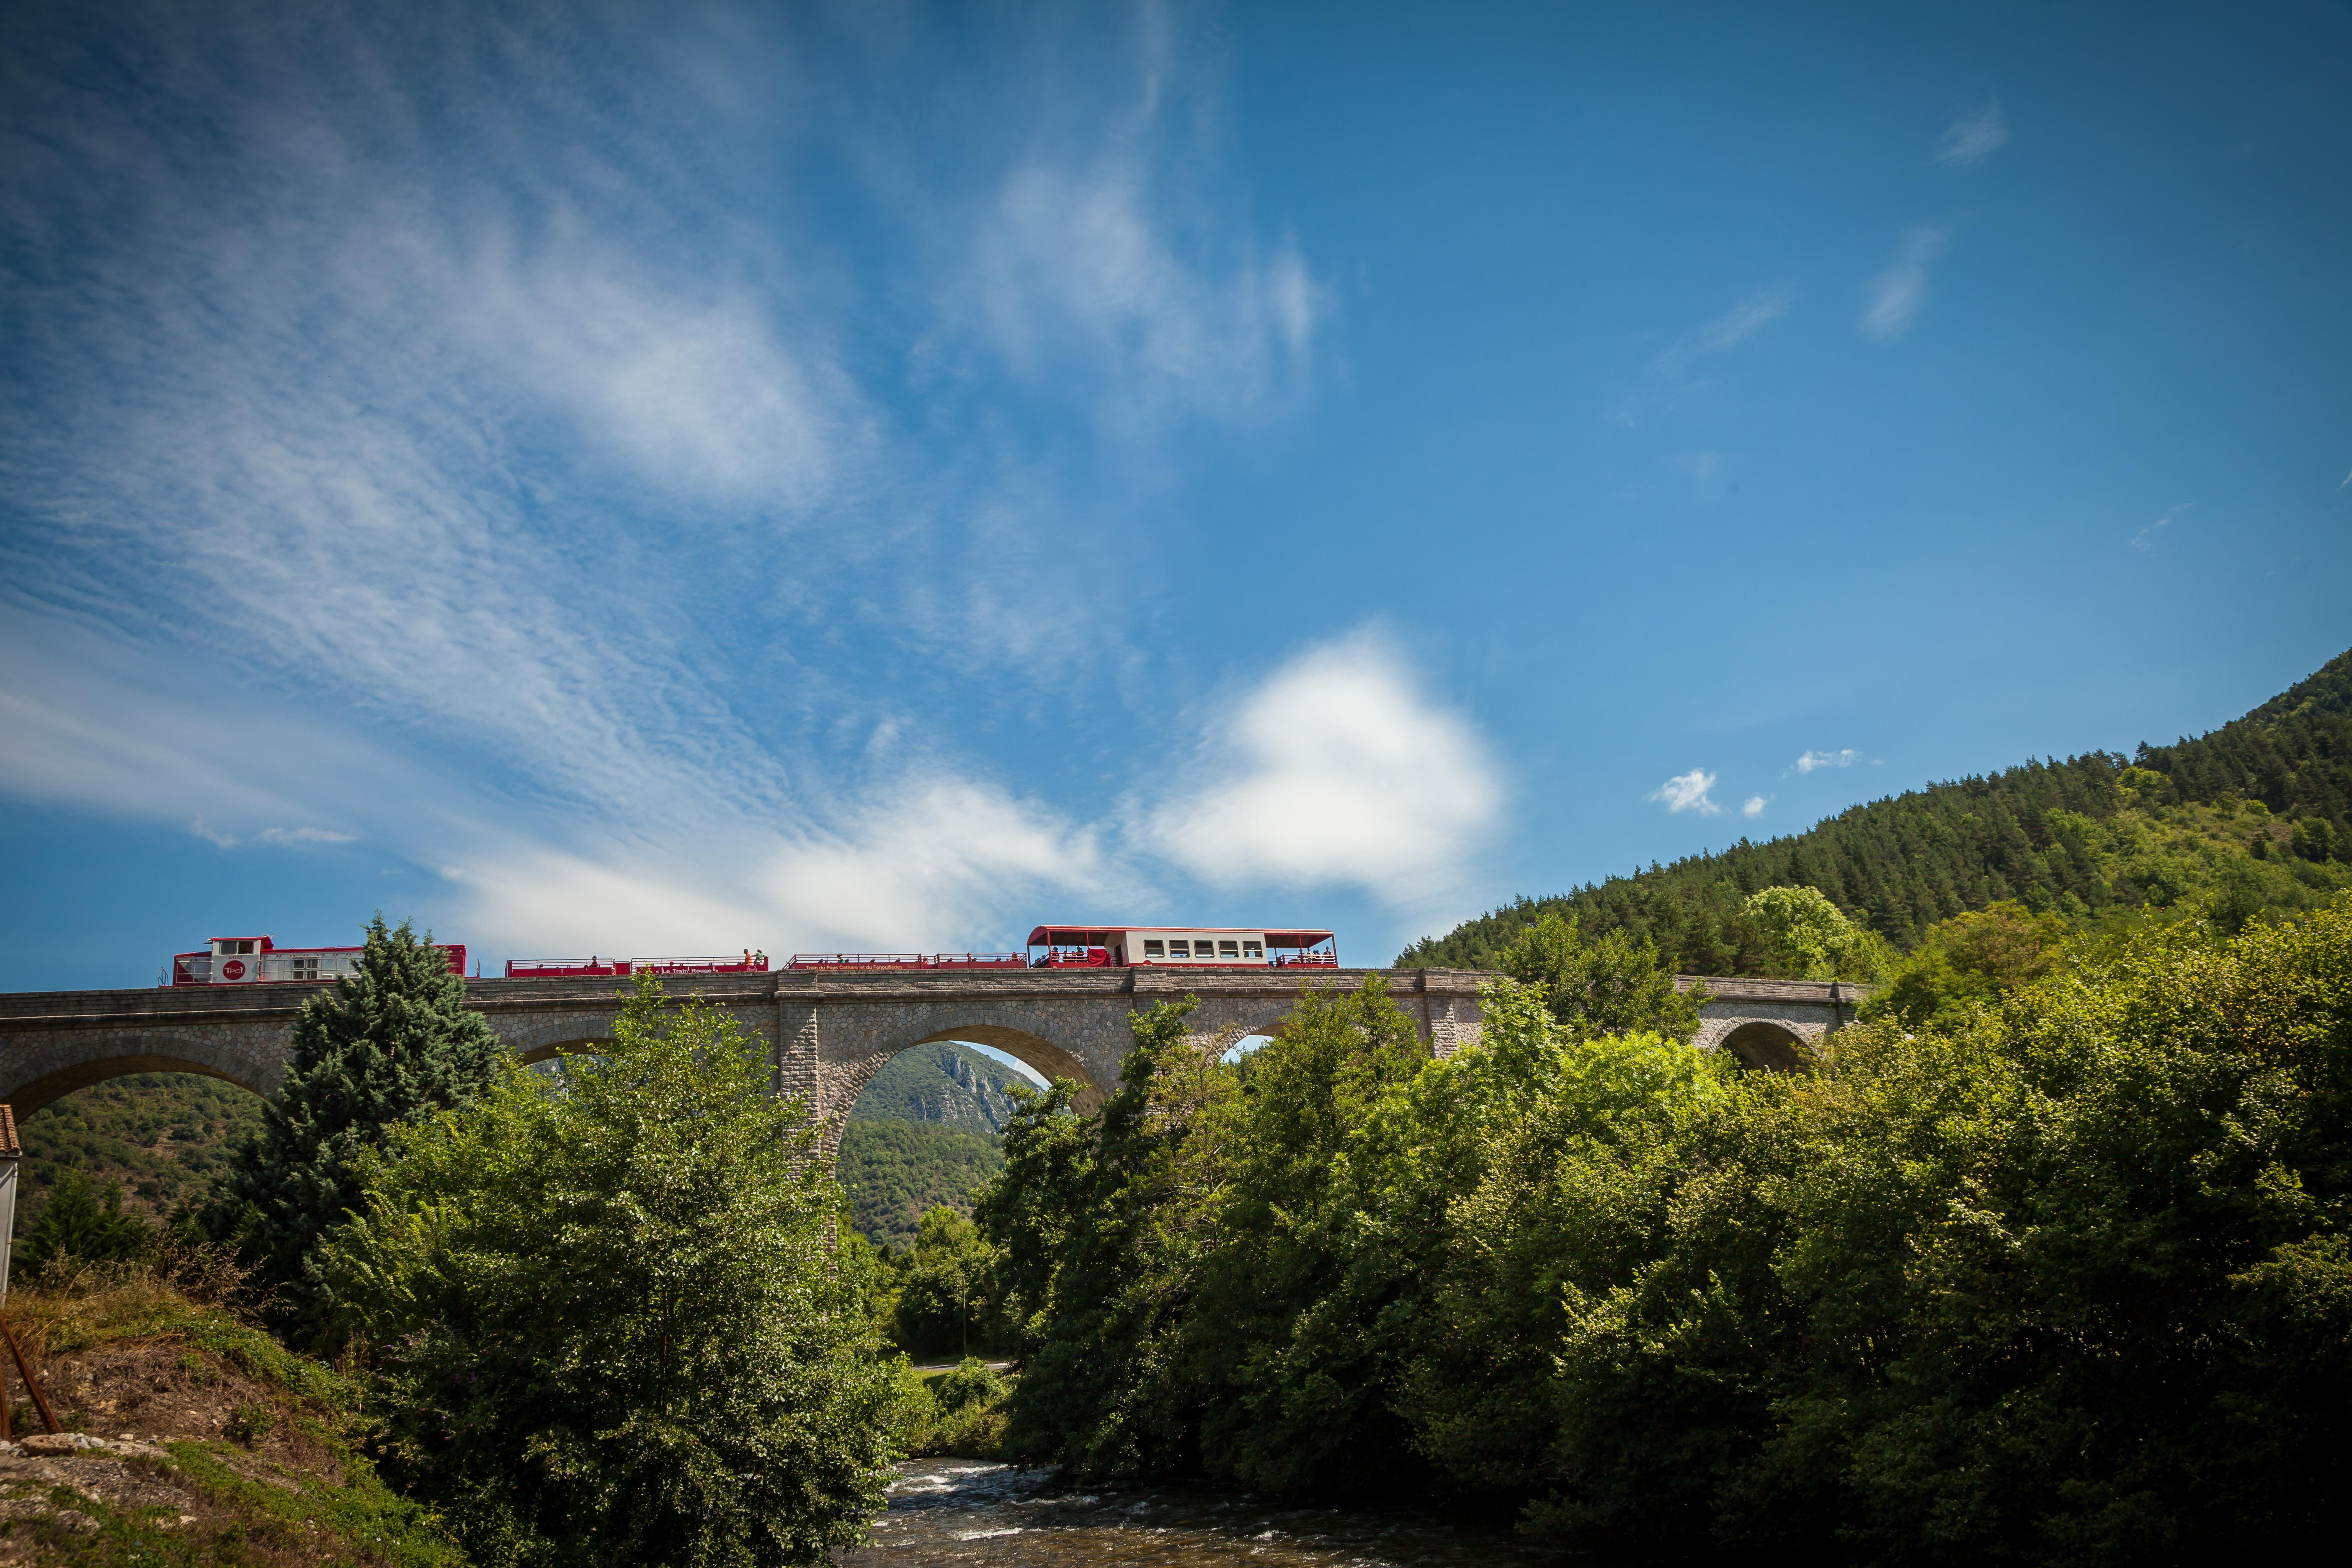 Train decouvert Viaduc Axat 2